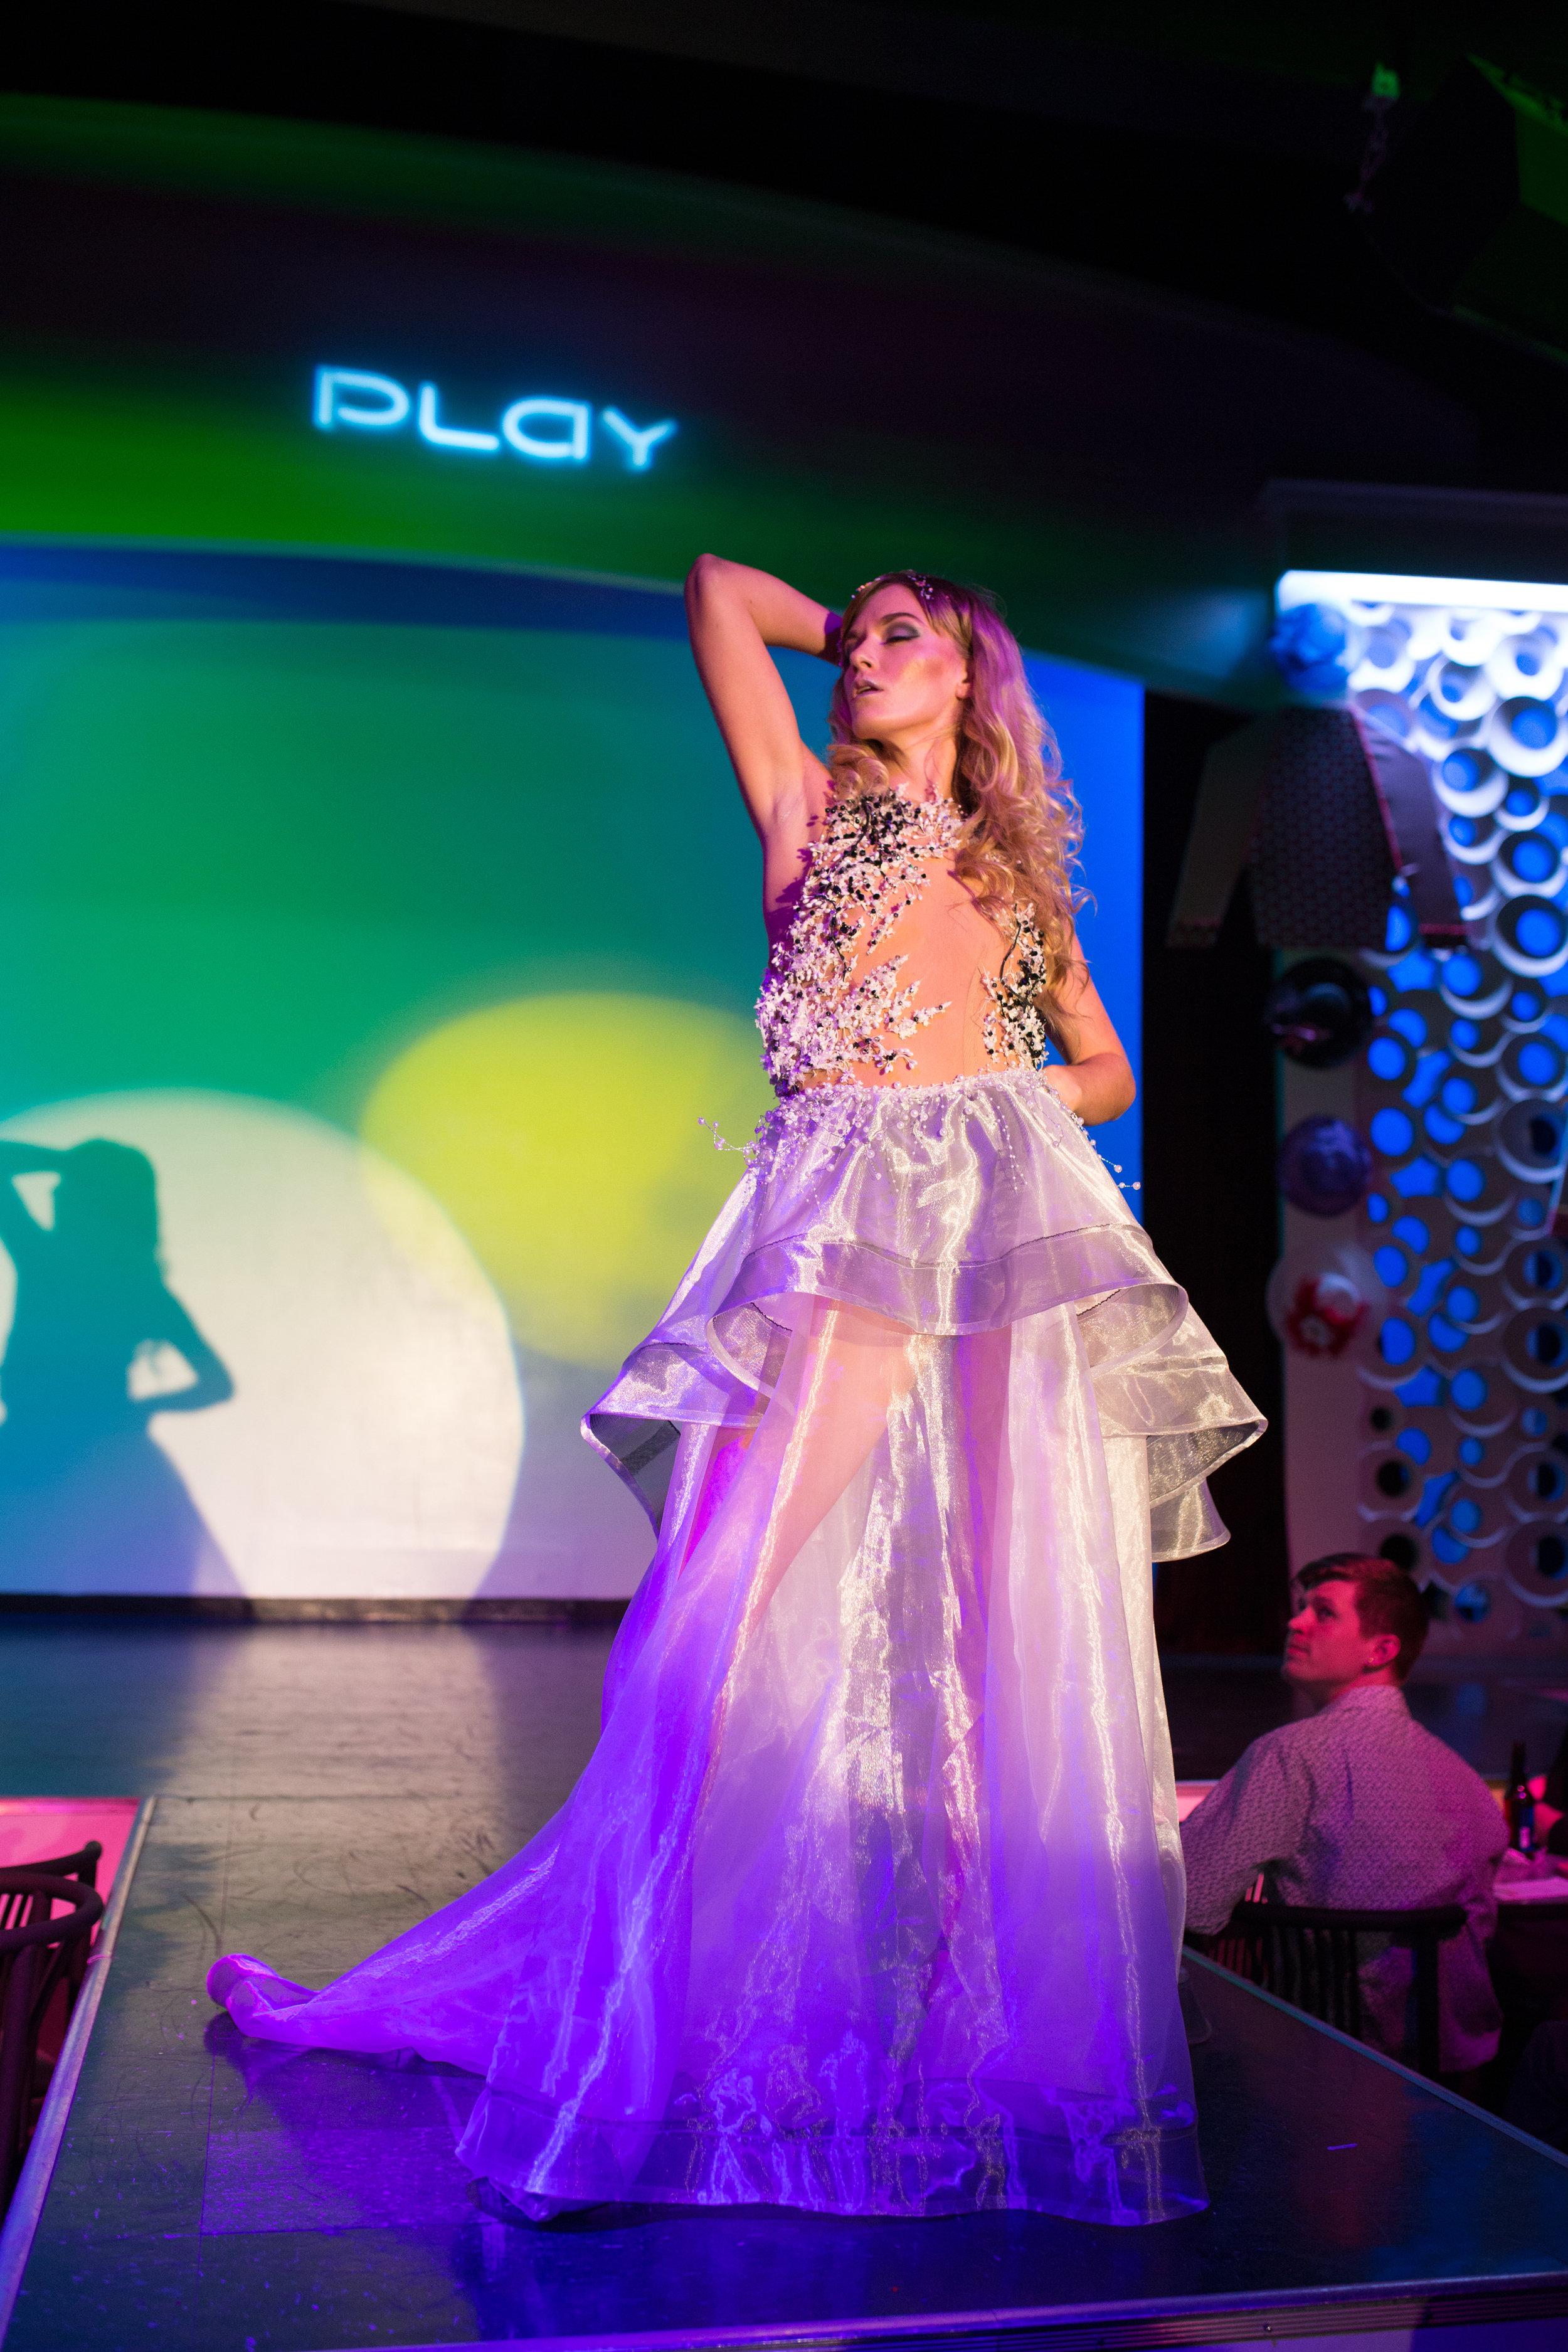 Rainbows & Roses Thurby 2017 WEBSITE FEVA PLAY Crystal Ludwick Photo 63.jpg